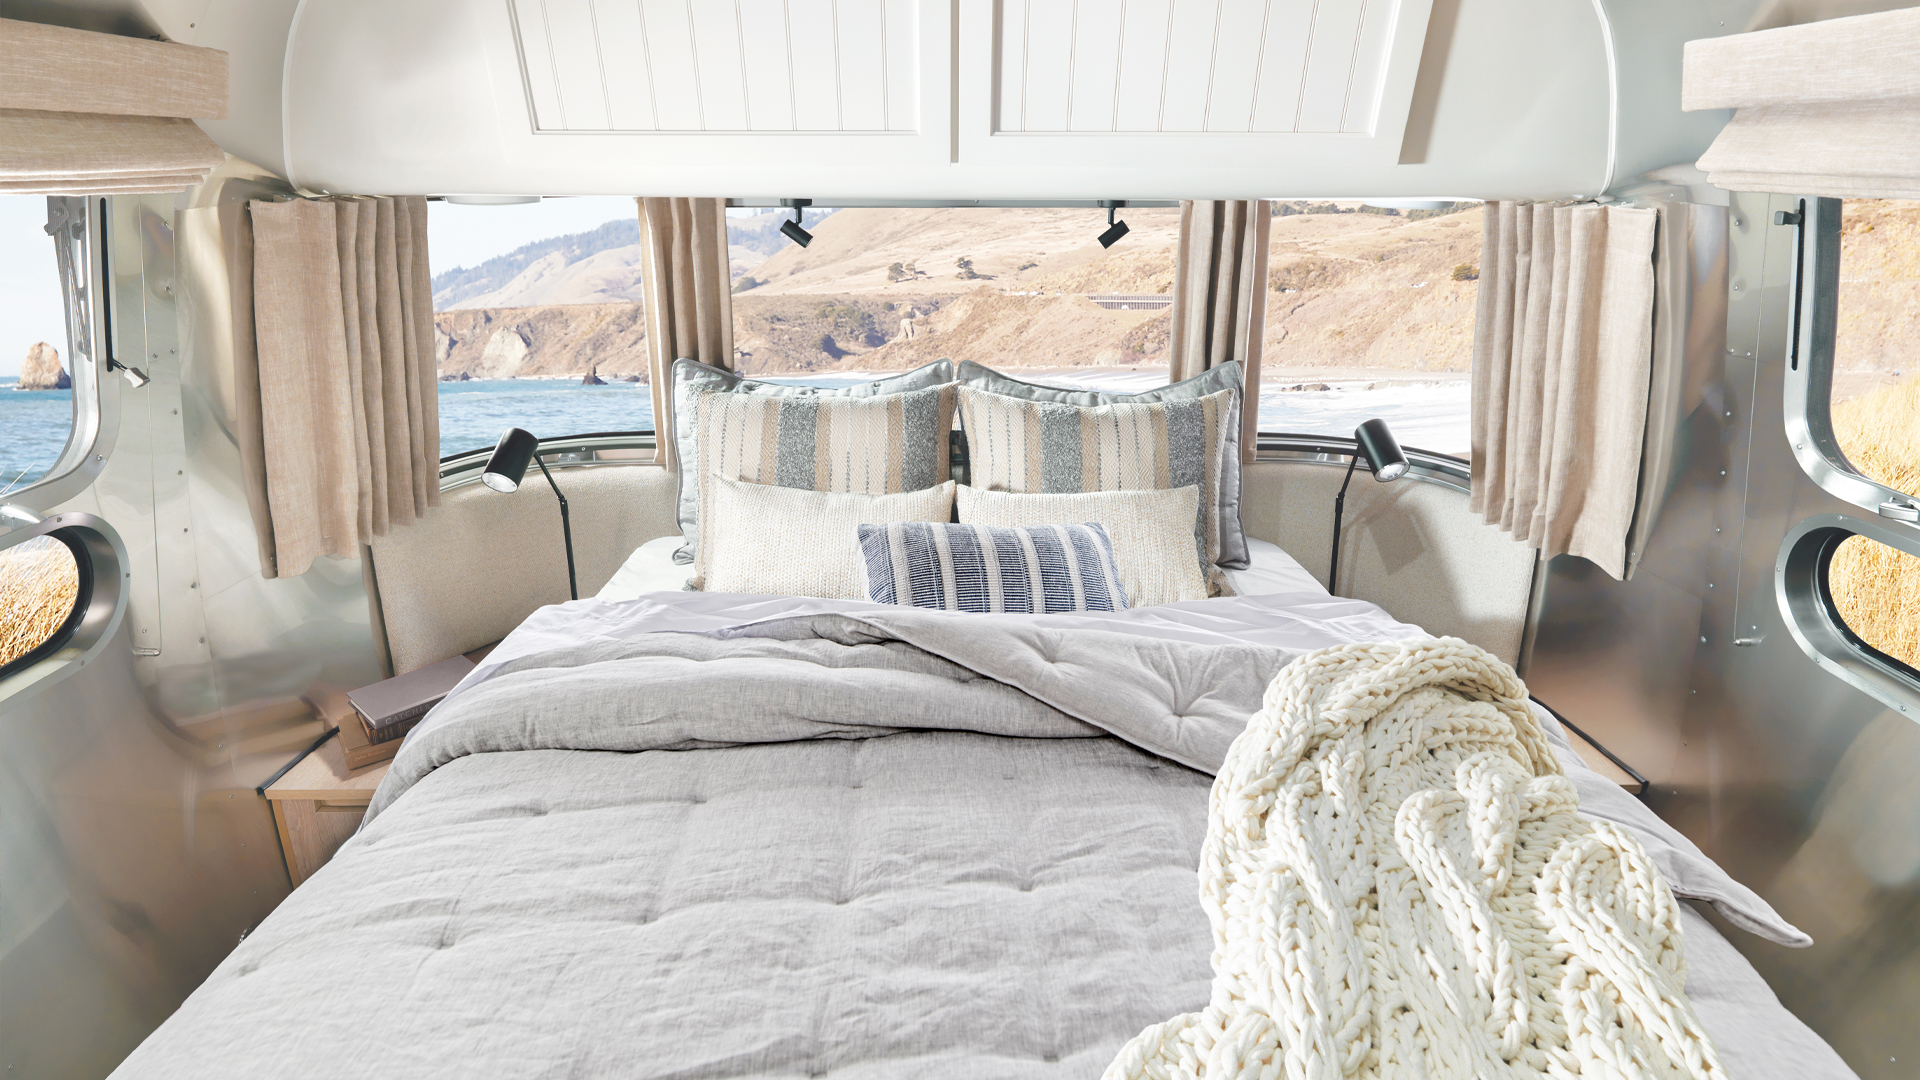 Airstream-X-Pottery-Barn-Interior-Bedroom